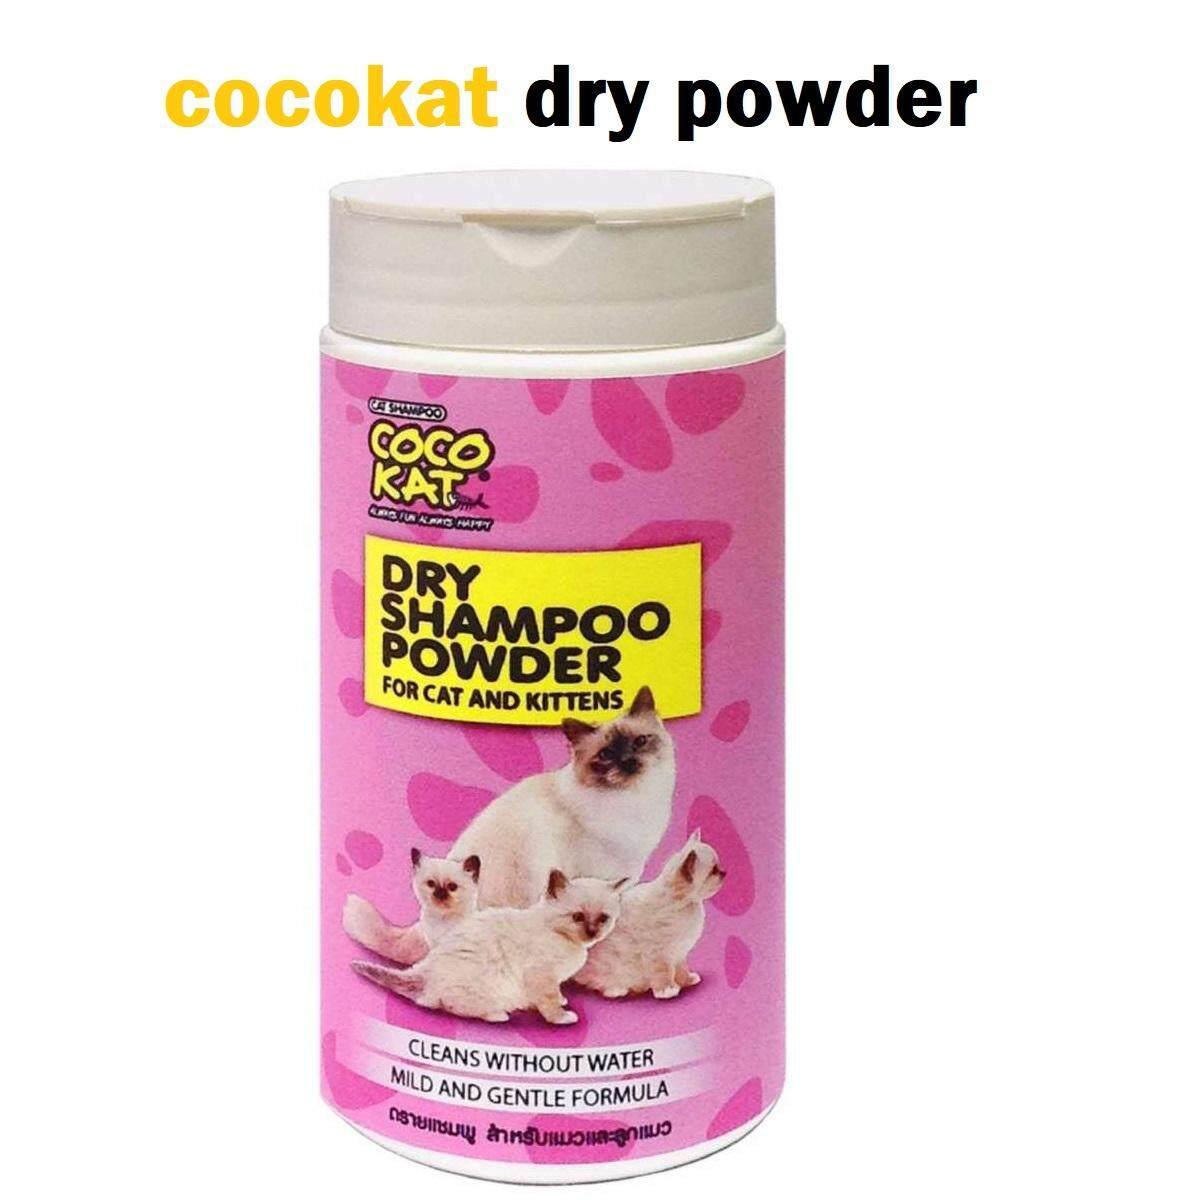 Cocokat Dry Powder แป้ง ทำความสะอาดแมว 150กรัม.